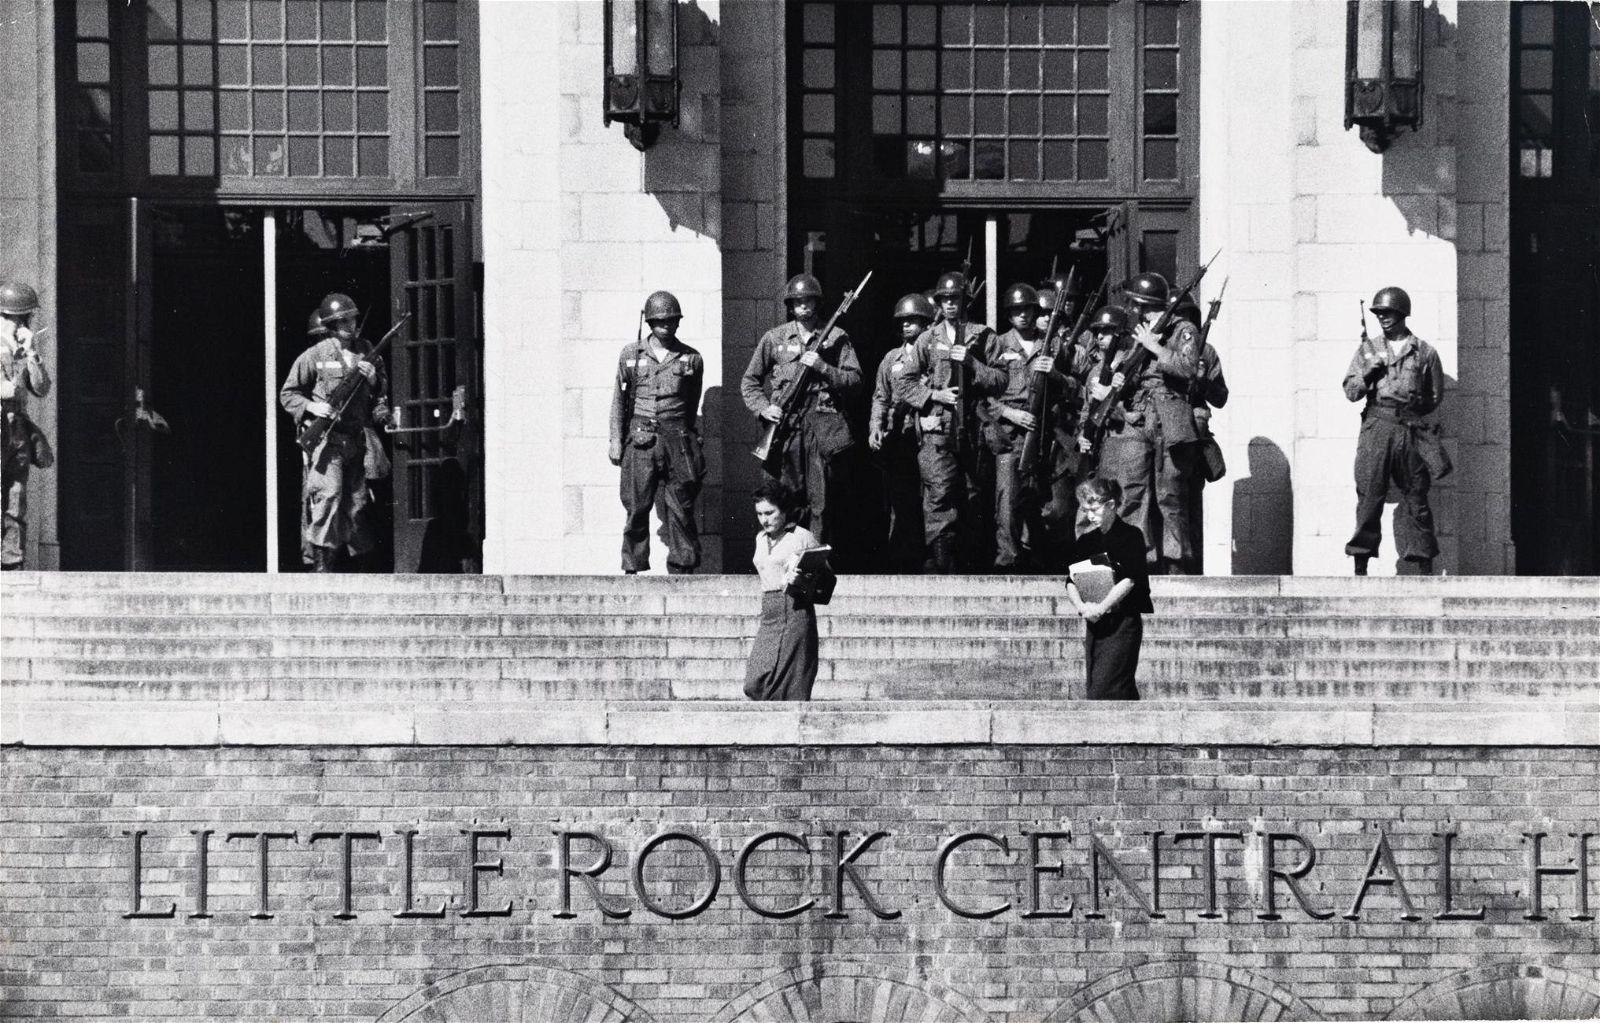 BURT GLINN Civil Rights Little Rock High 1957